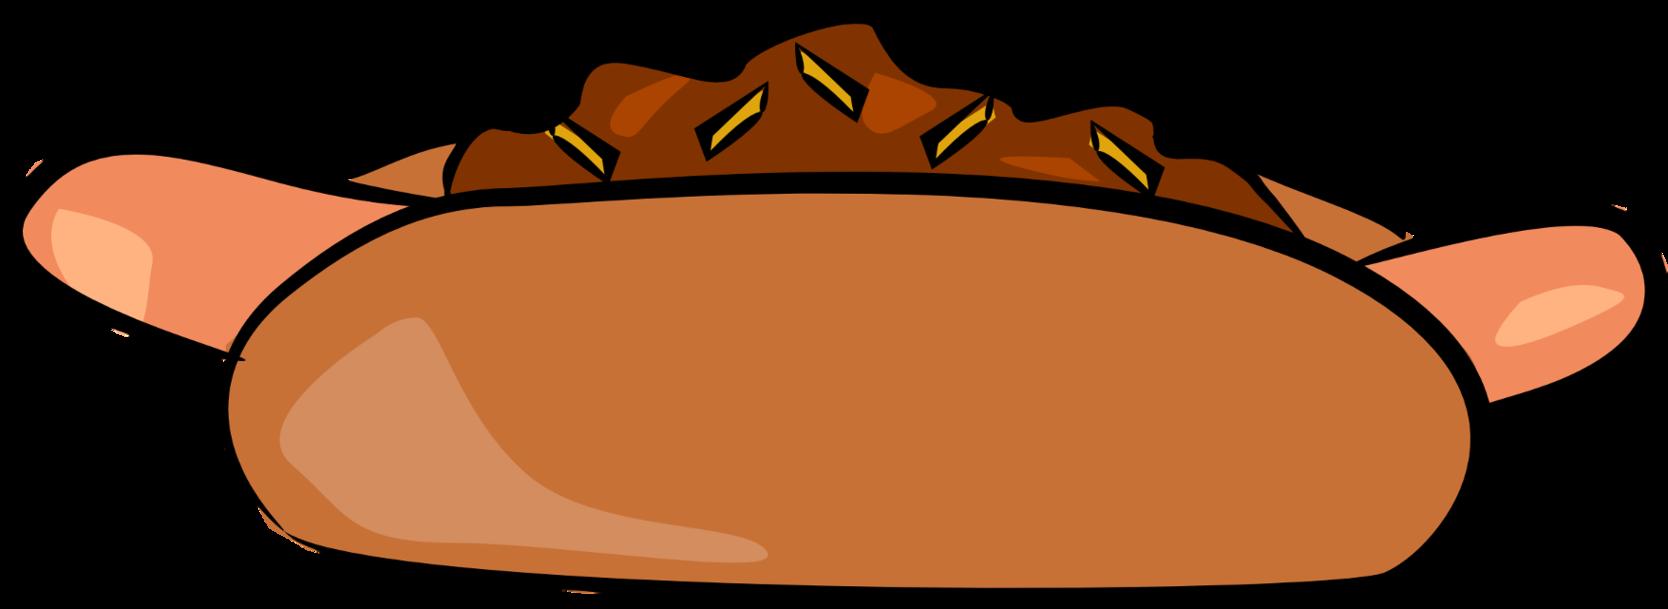 Hot con carne cheese. Hotdog clipart chili dog